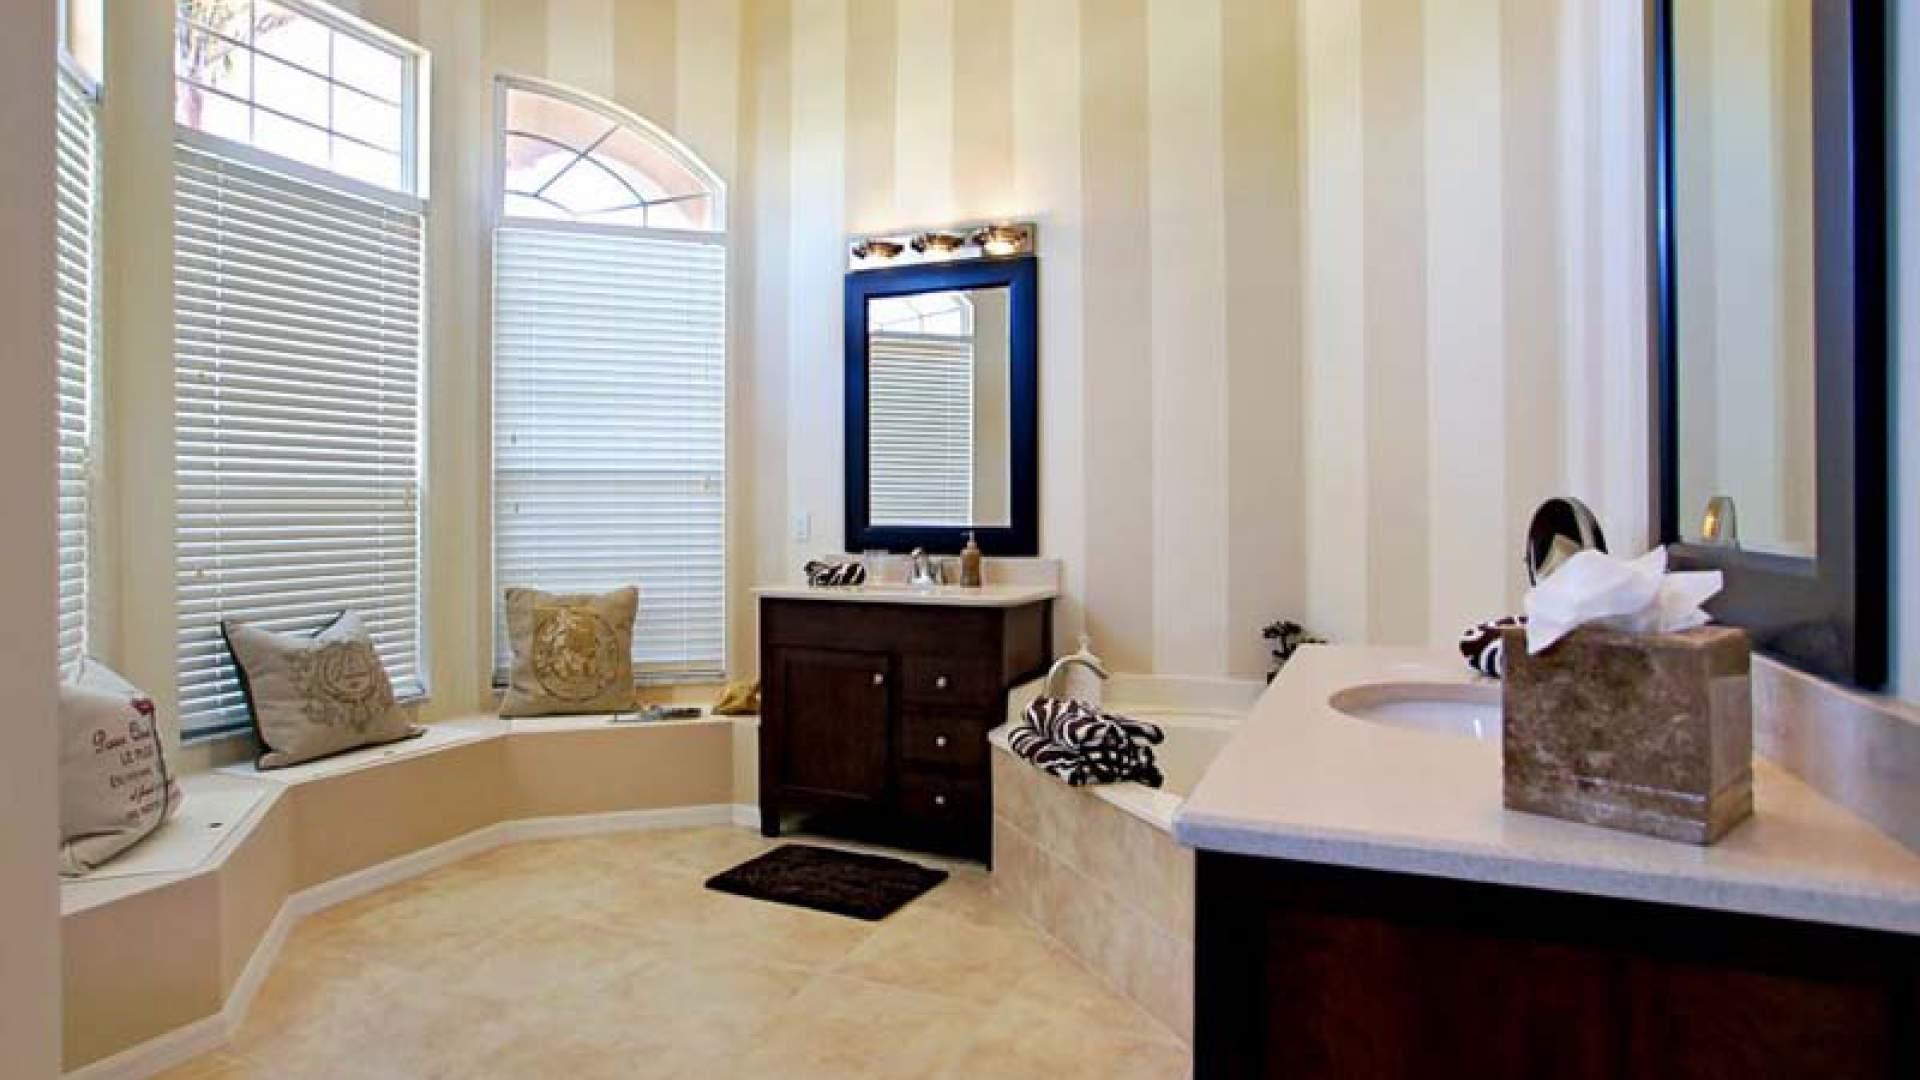 dusche vorm fenster beautiful awesome walk in dusche vorm. Black Bedroom Furniture Sets. Home Design Ideas